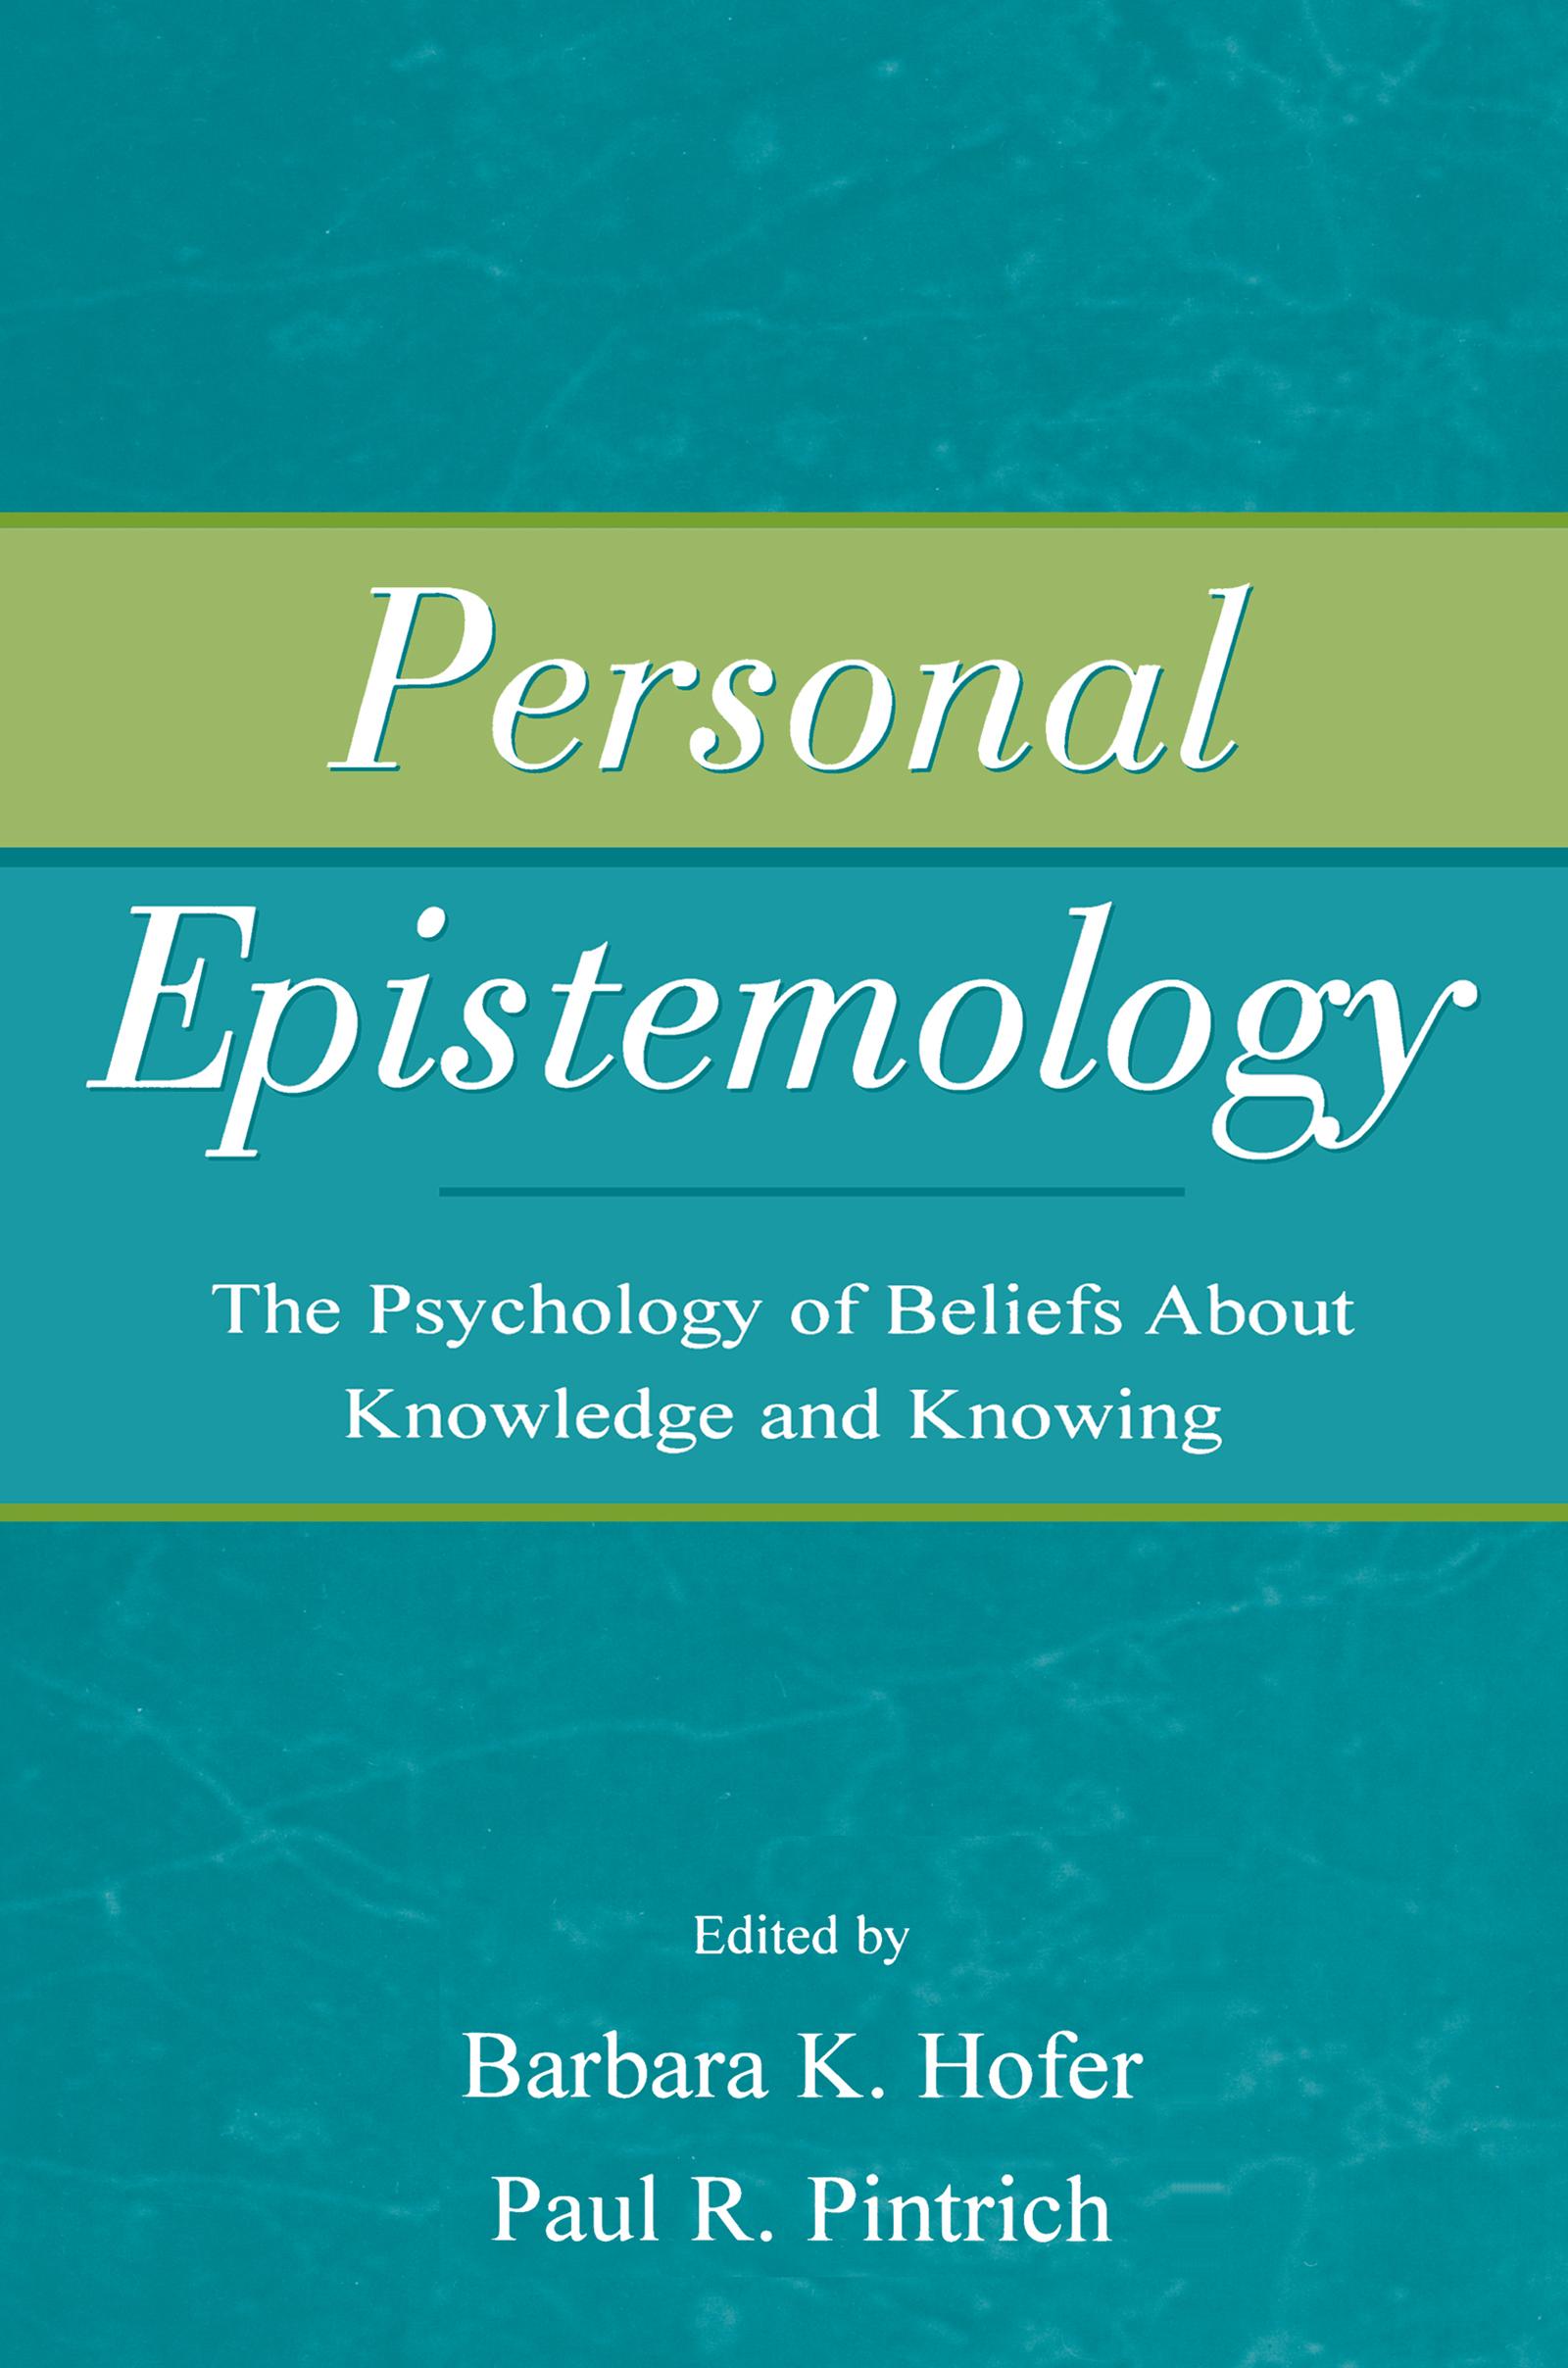 Personal Epistemology